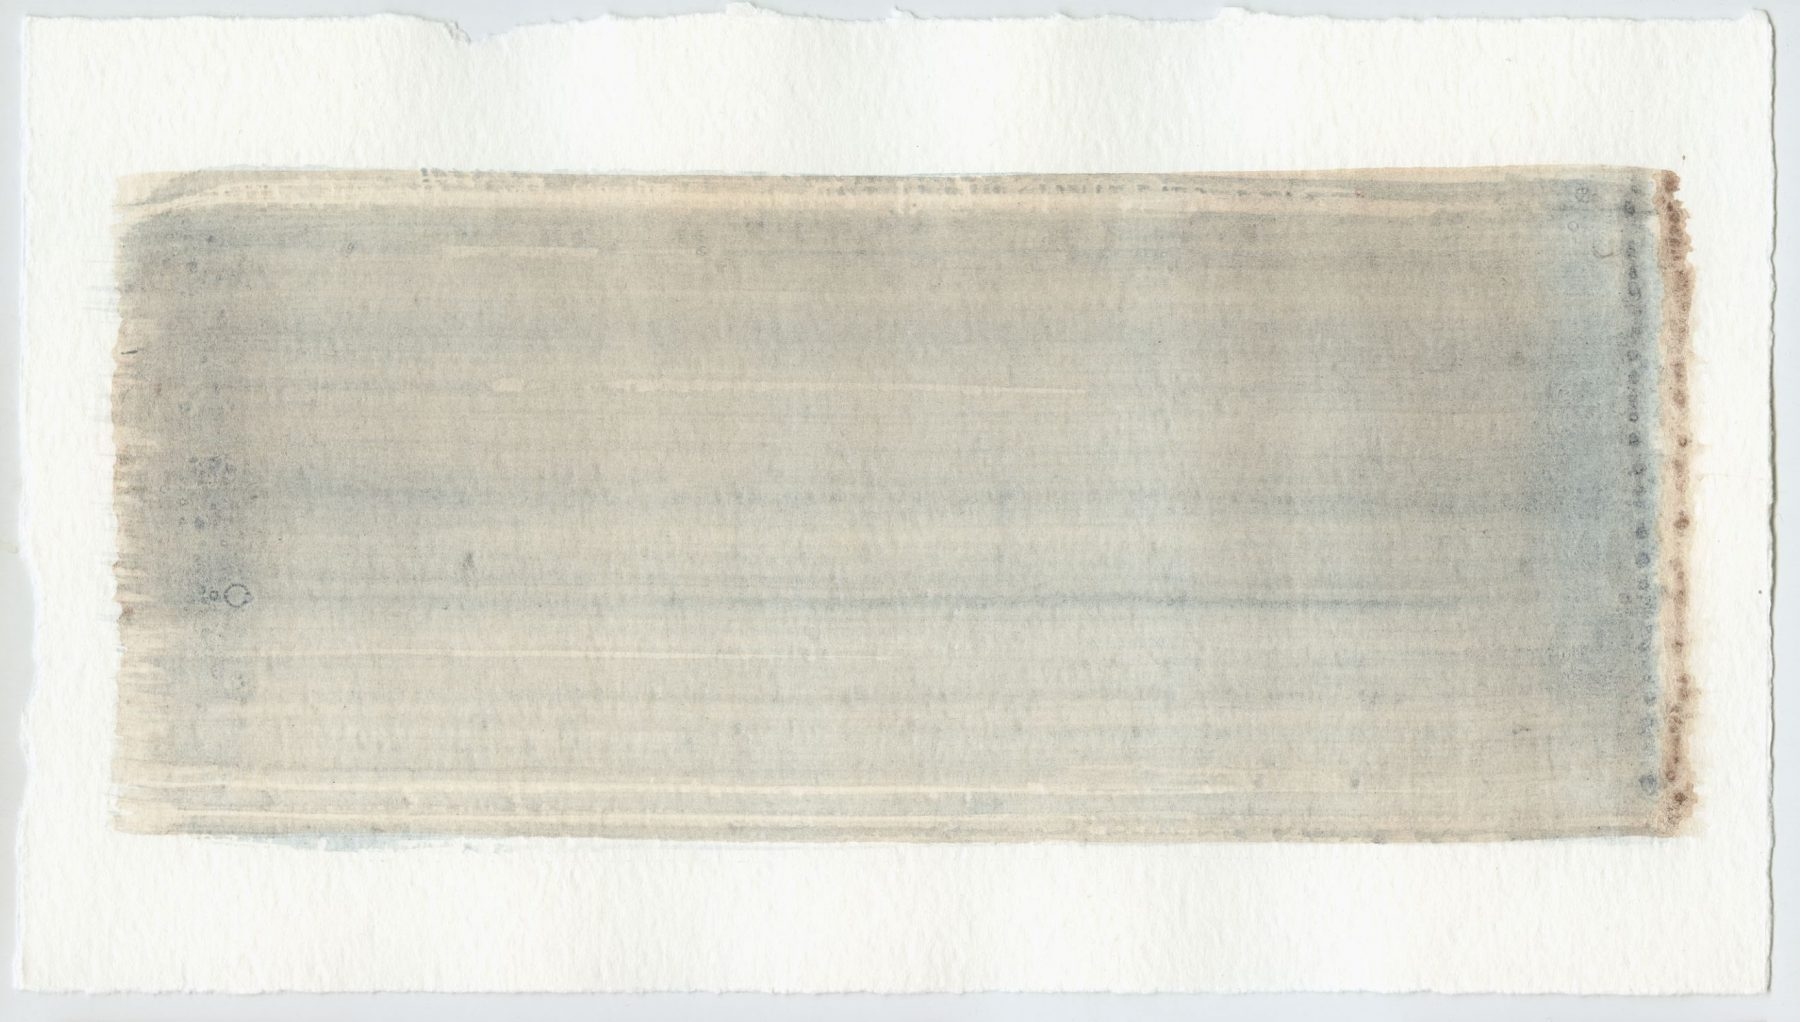 Brush stroke no. 109 - Pigment: Vivianiet (from Kremer Pigmente) Selfmade pigment: IJzeroer gebrand